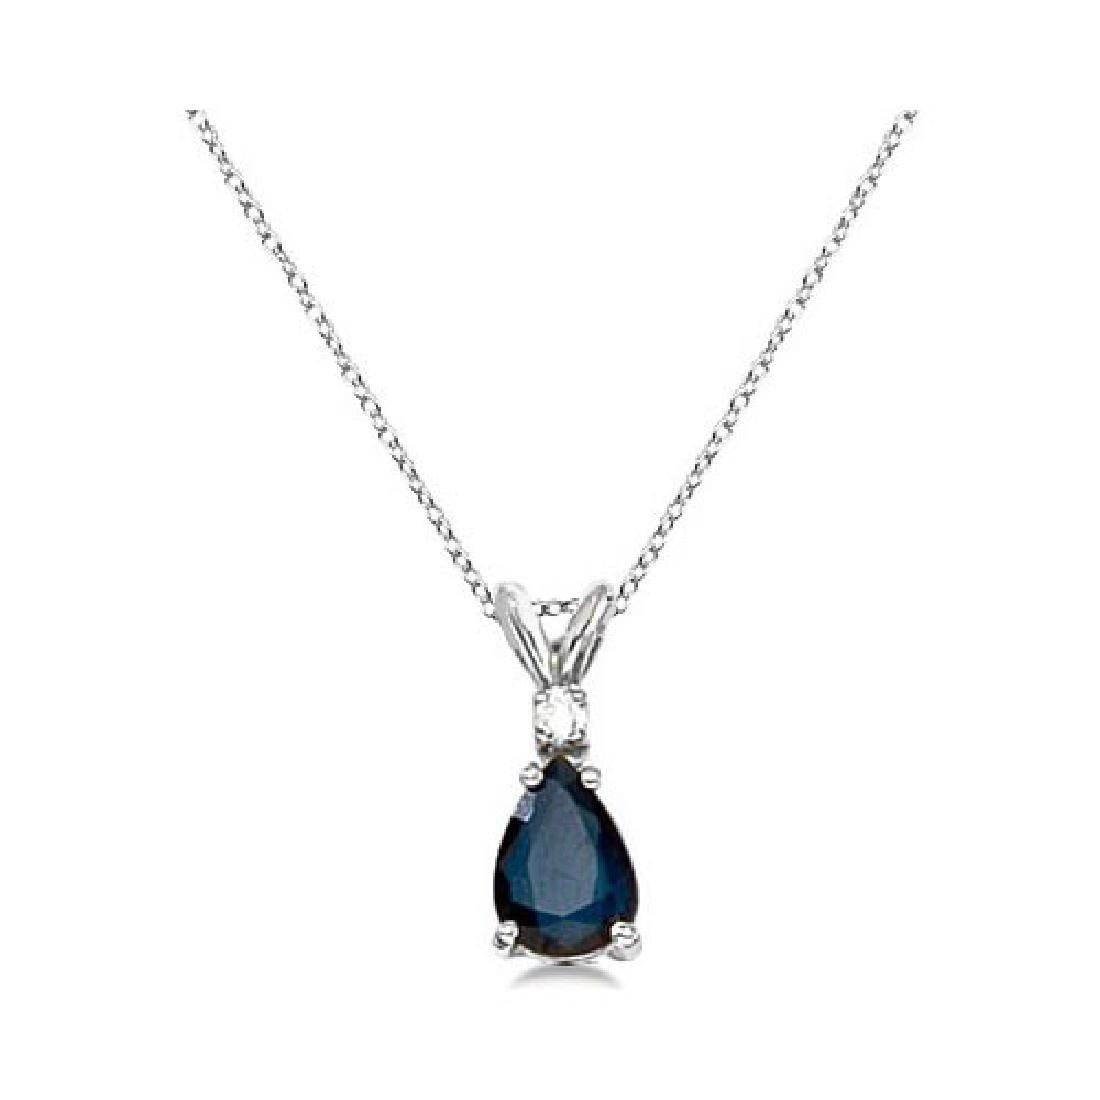 Pear Blue Sapphire and Diamond Solitaire Pendant Neckla